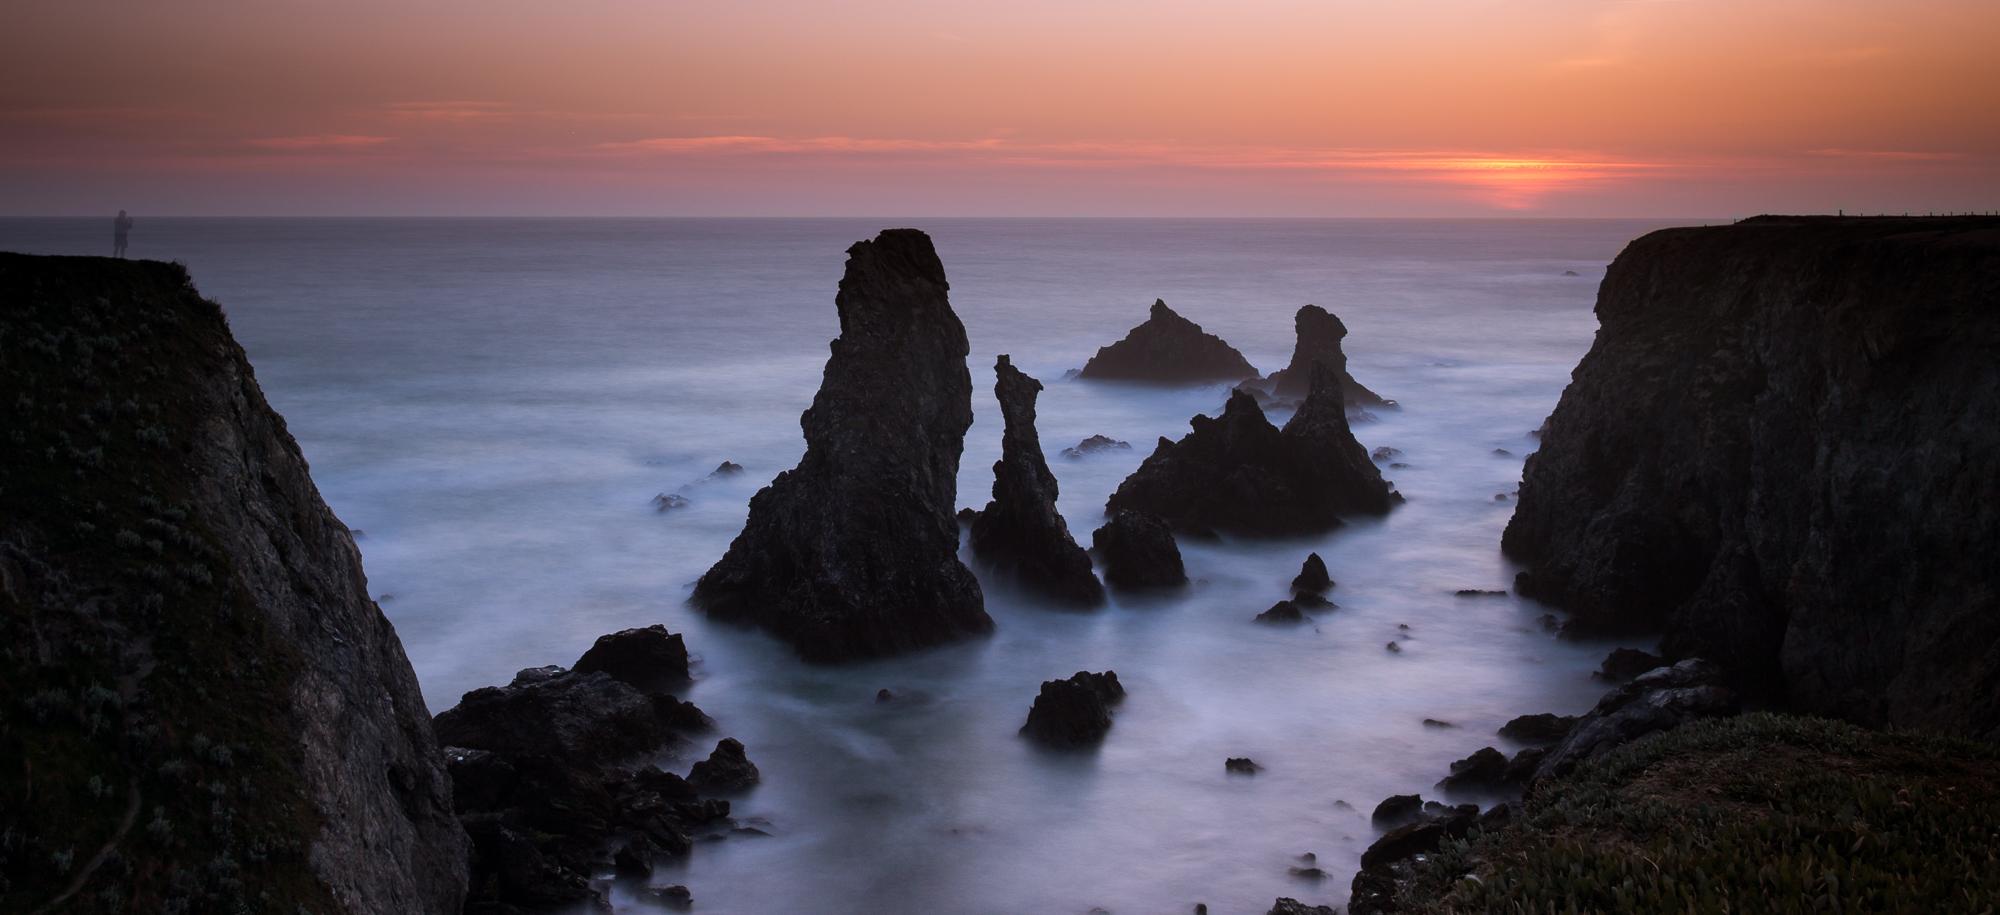 Belle-ile en Mer – 2018 © Christelle Hachet Photographie